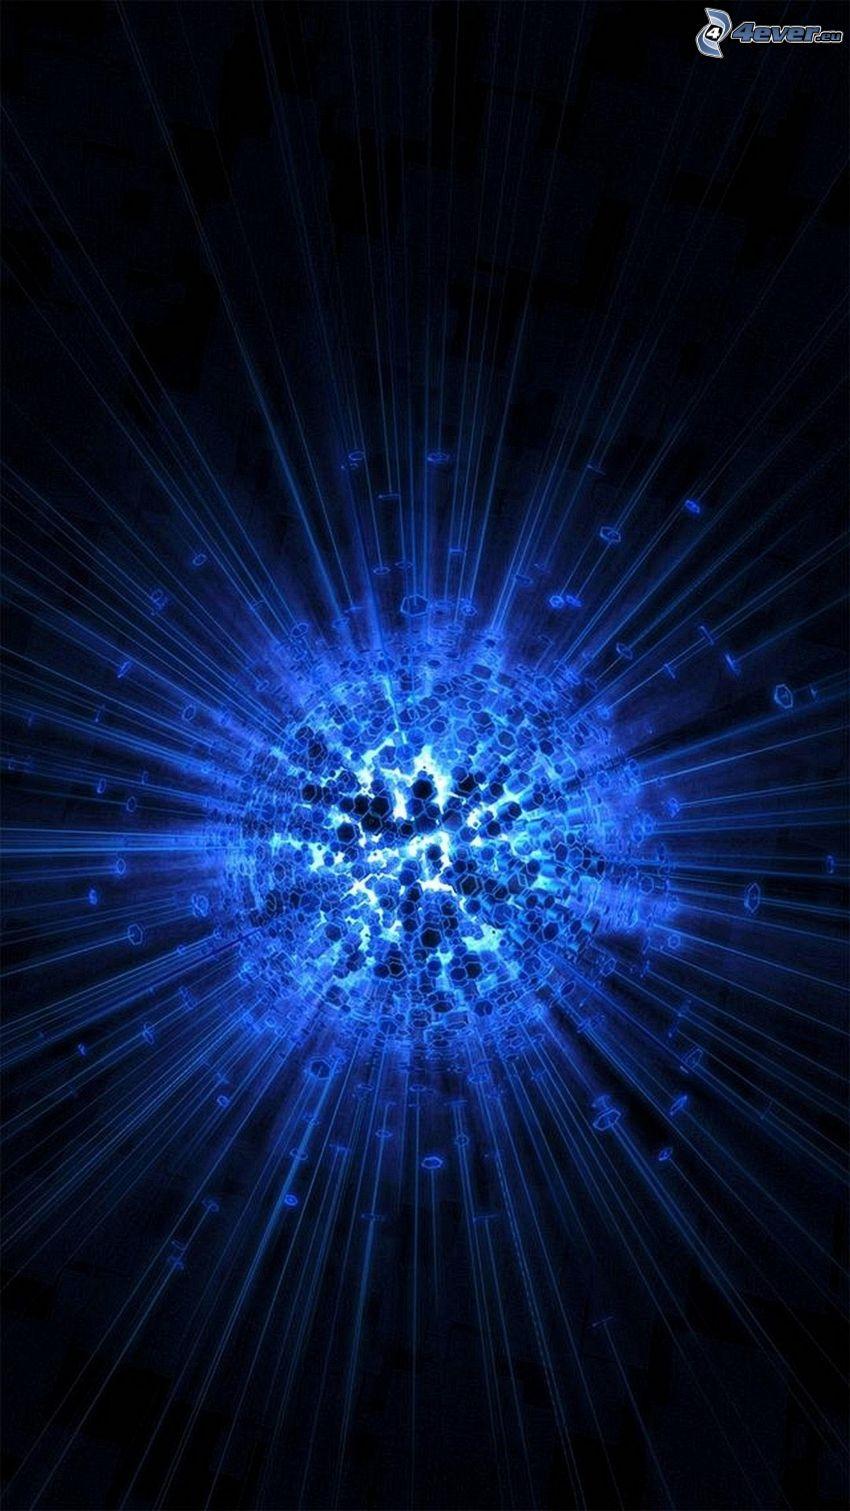 balle, hexagones, lignes bleues, fond bleu